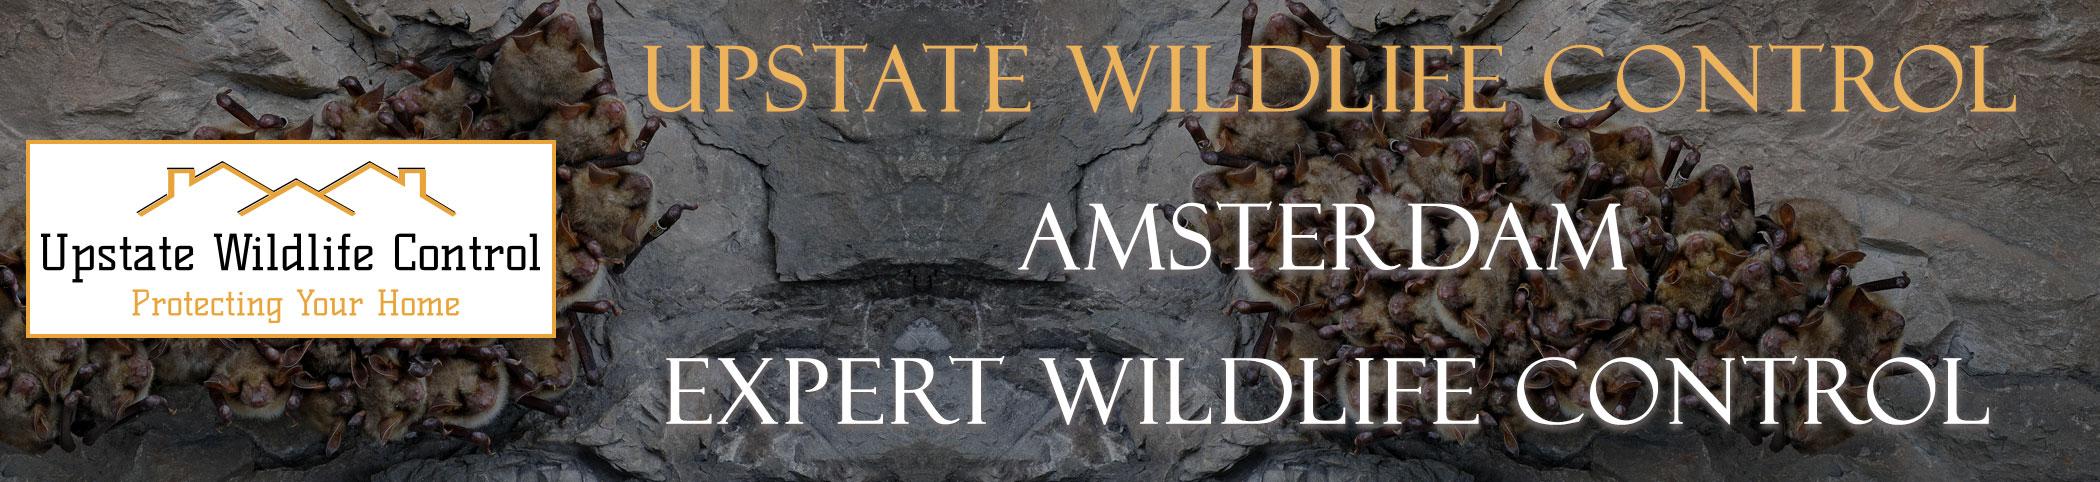 Upstate-Wildlife-Control-Amsterdam-header